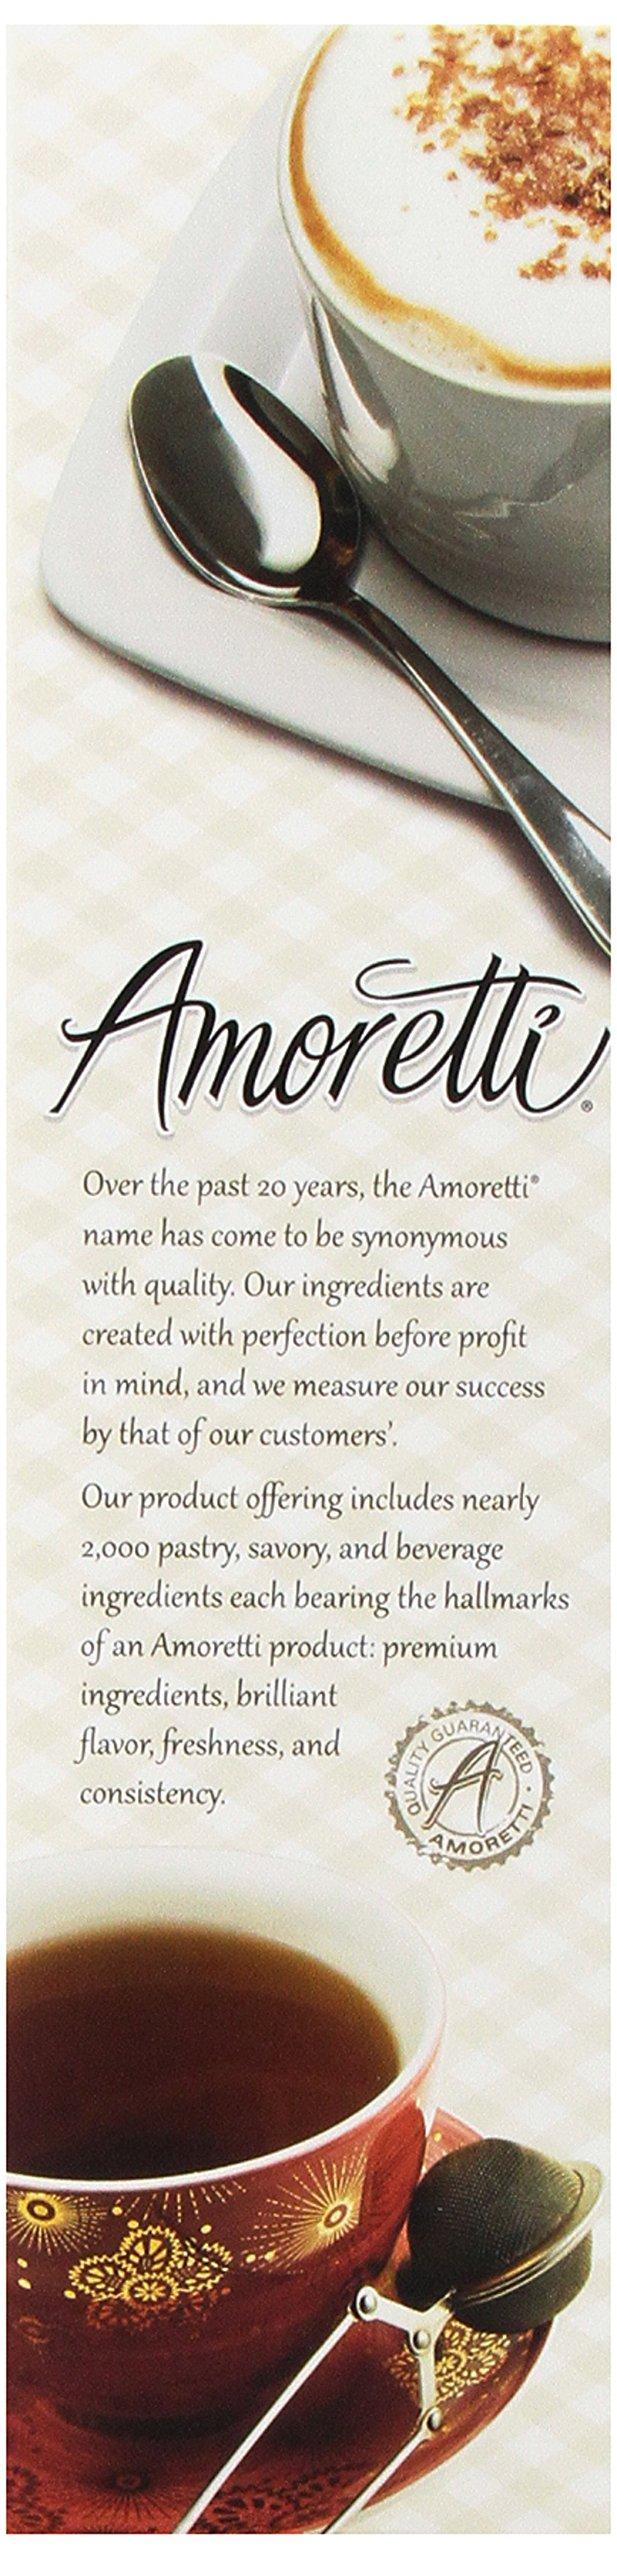 Amoretti Premium Caramel Syrup 750ml 3 Pack by Amoretti (Image #5)